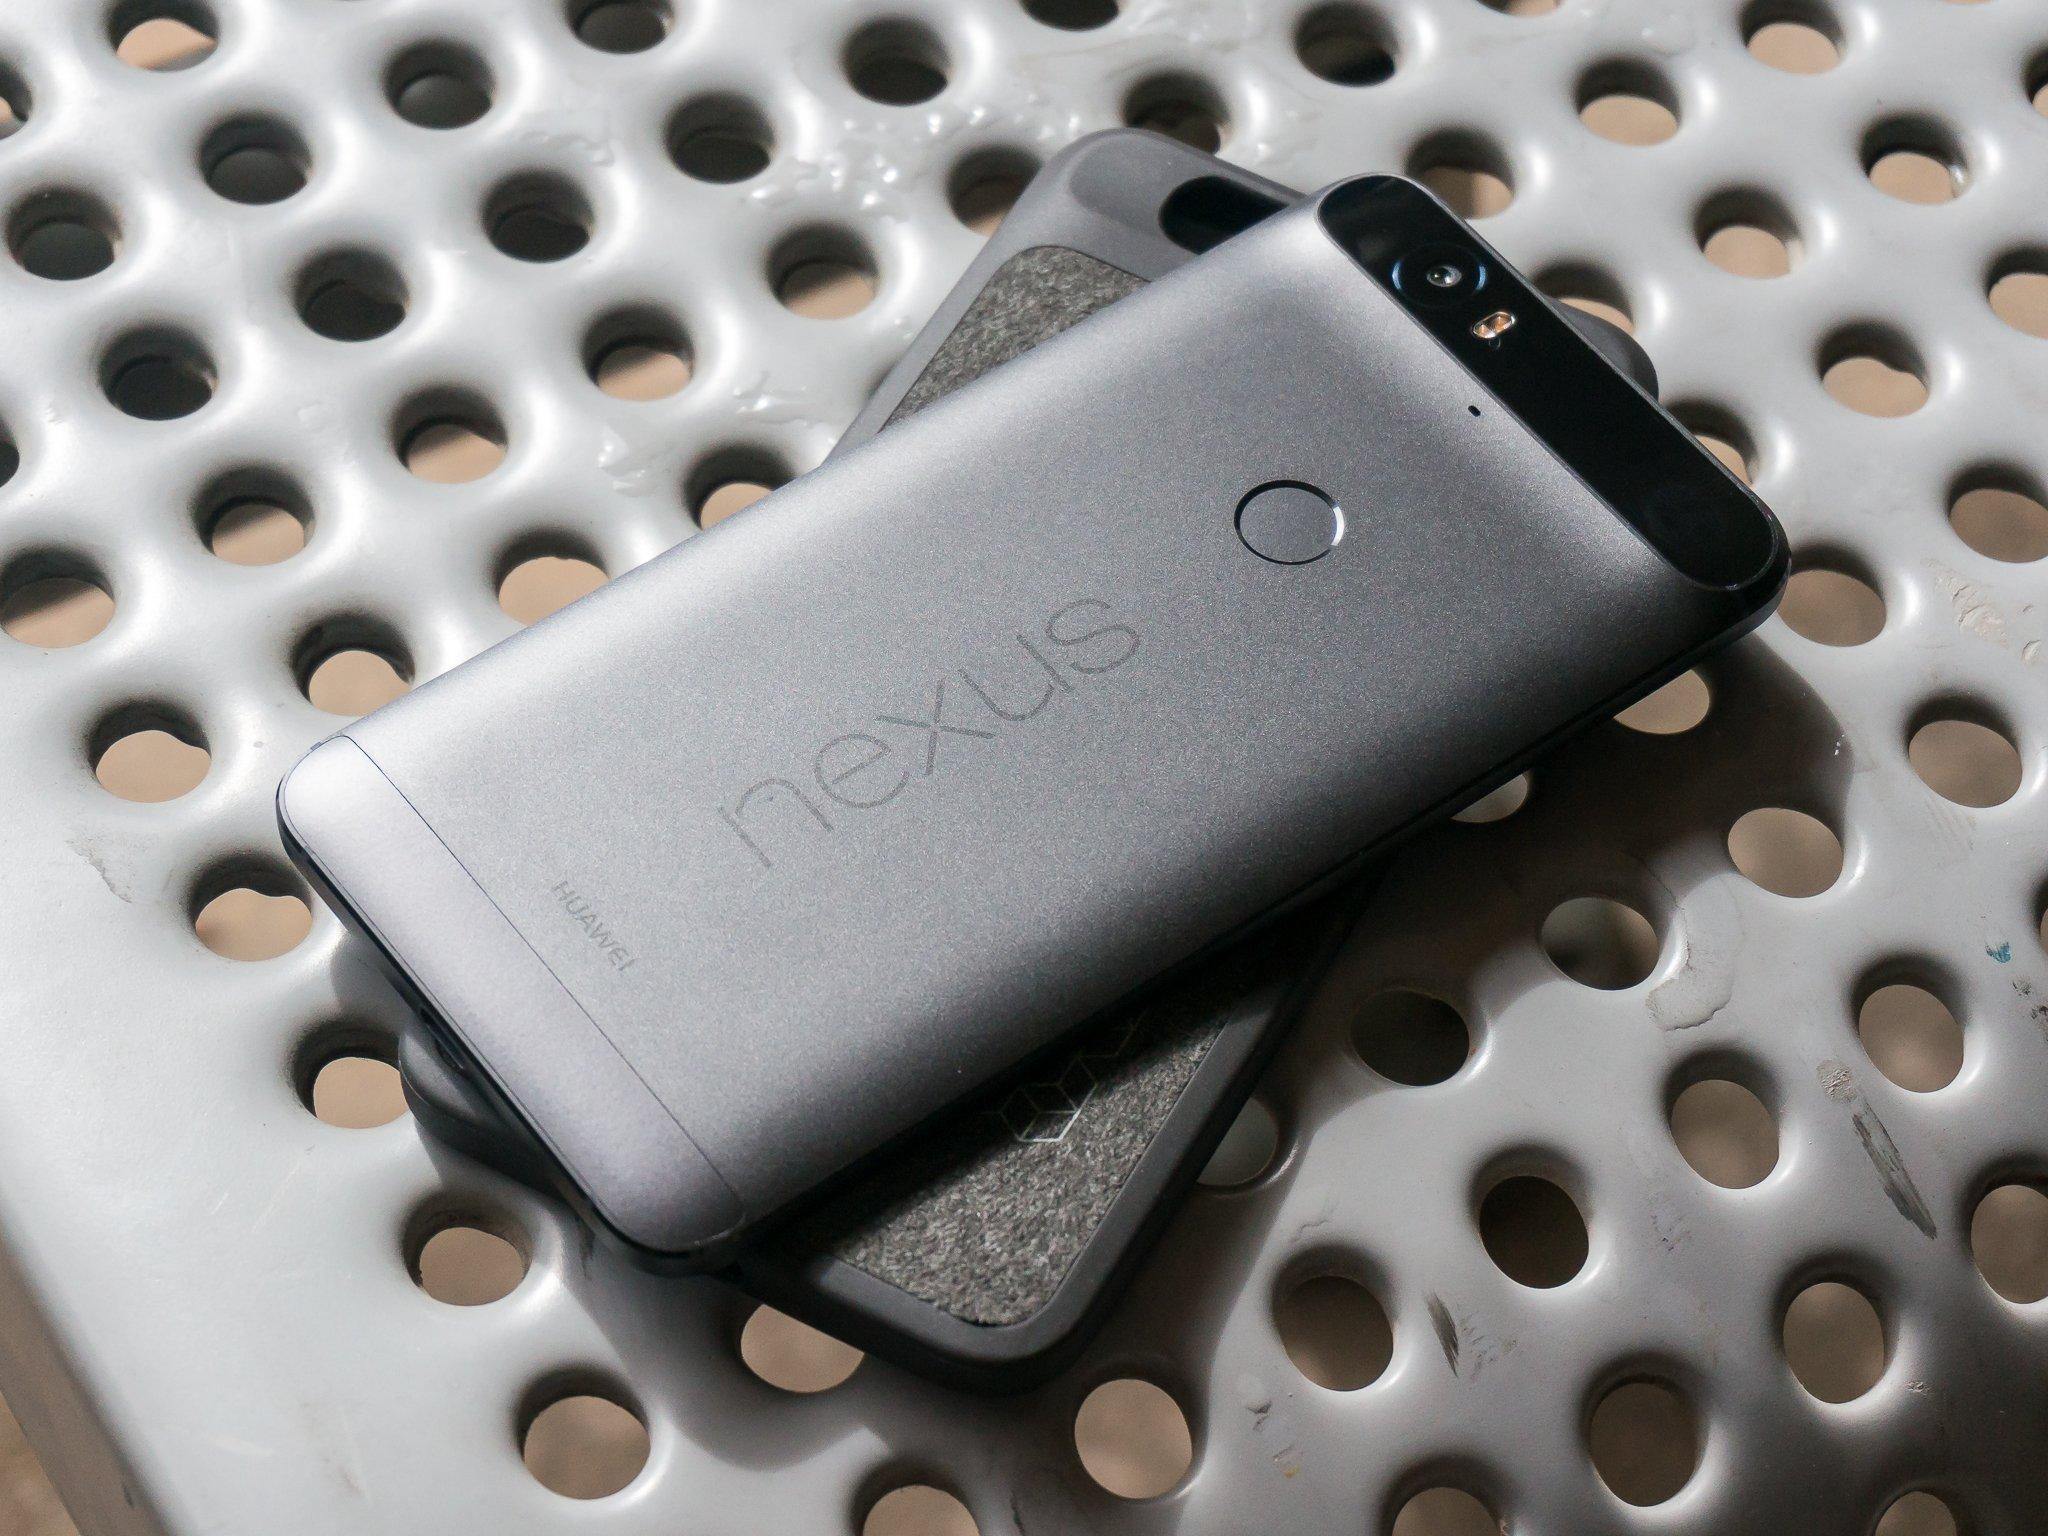 Fascinating Huawei Nexus Review Huawei Nexus Review Android Central Nexus 6p Camera Review 2016 Nexus 6p Front Camera Review dpreview Nexus 6p Camera Review